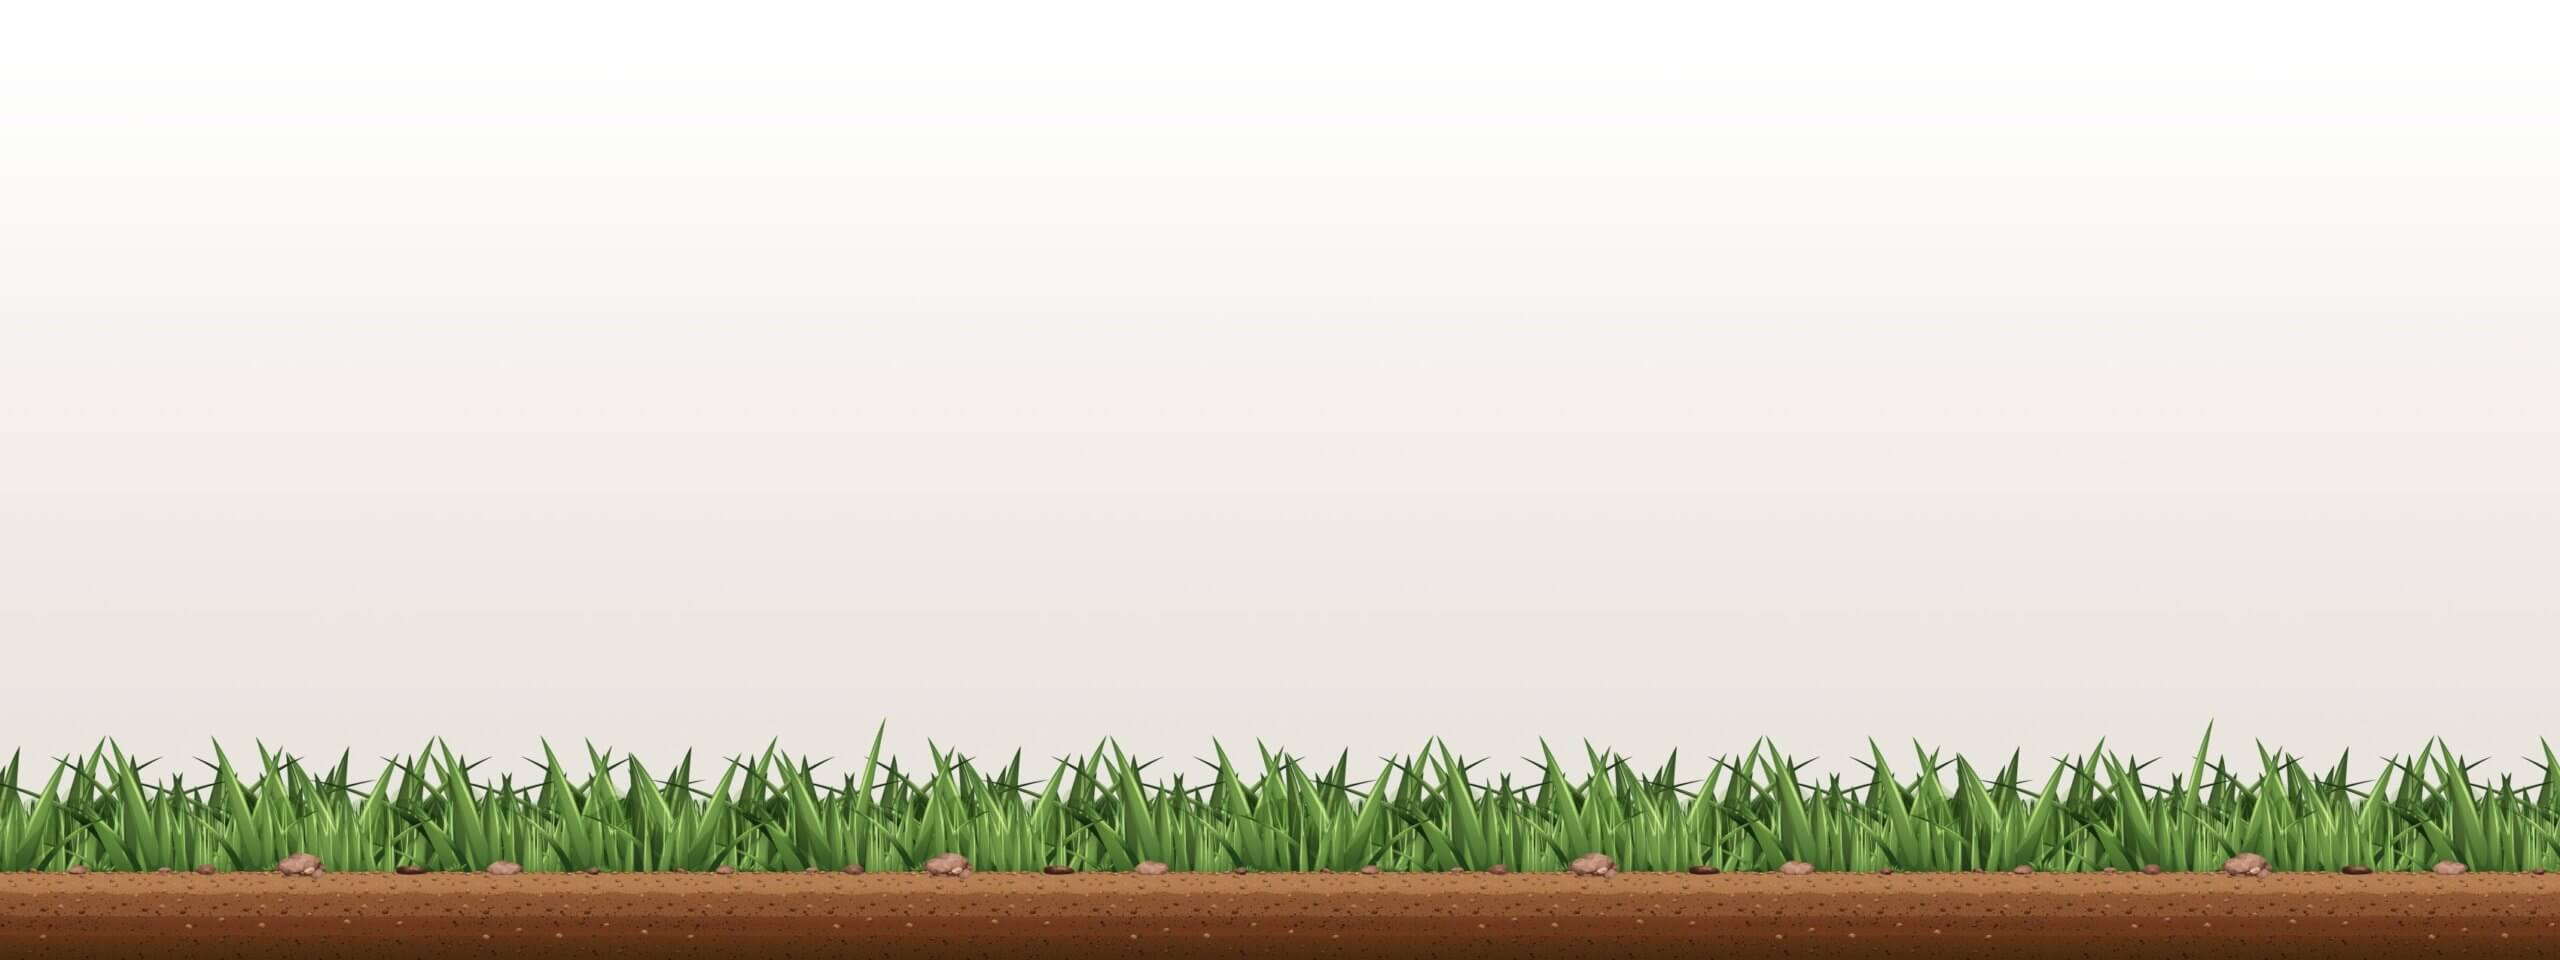 landscaper-grass-background